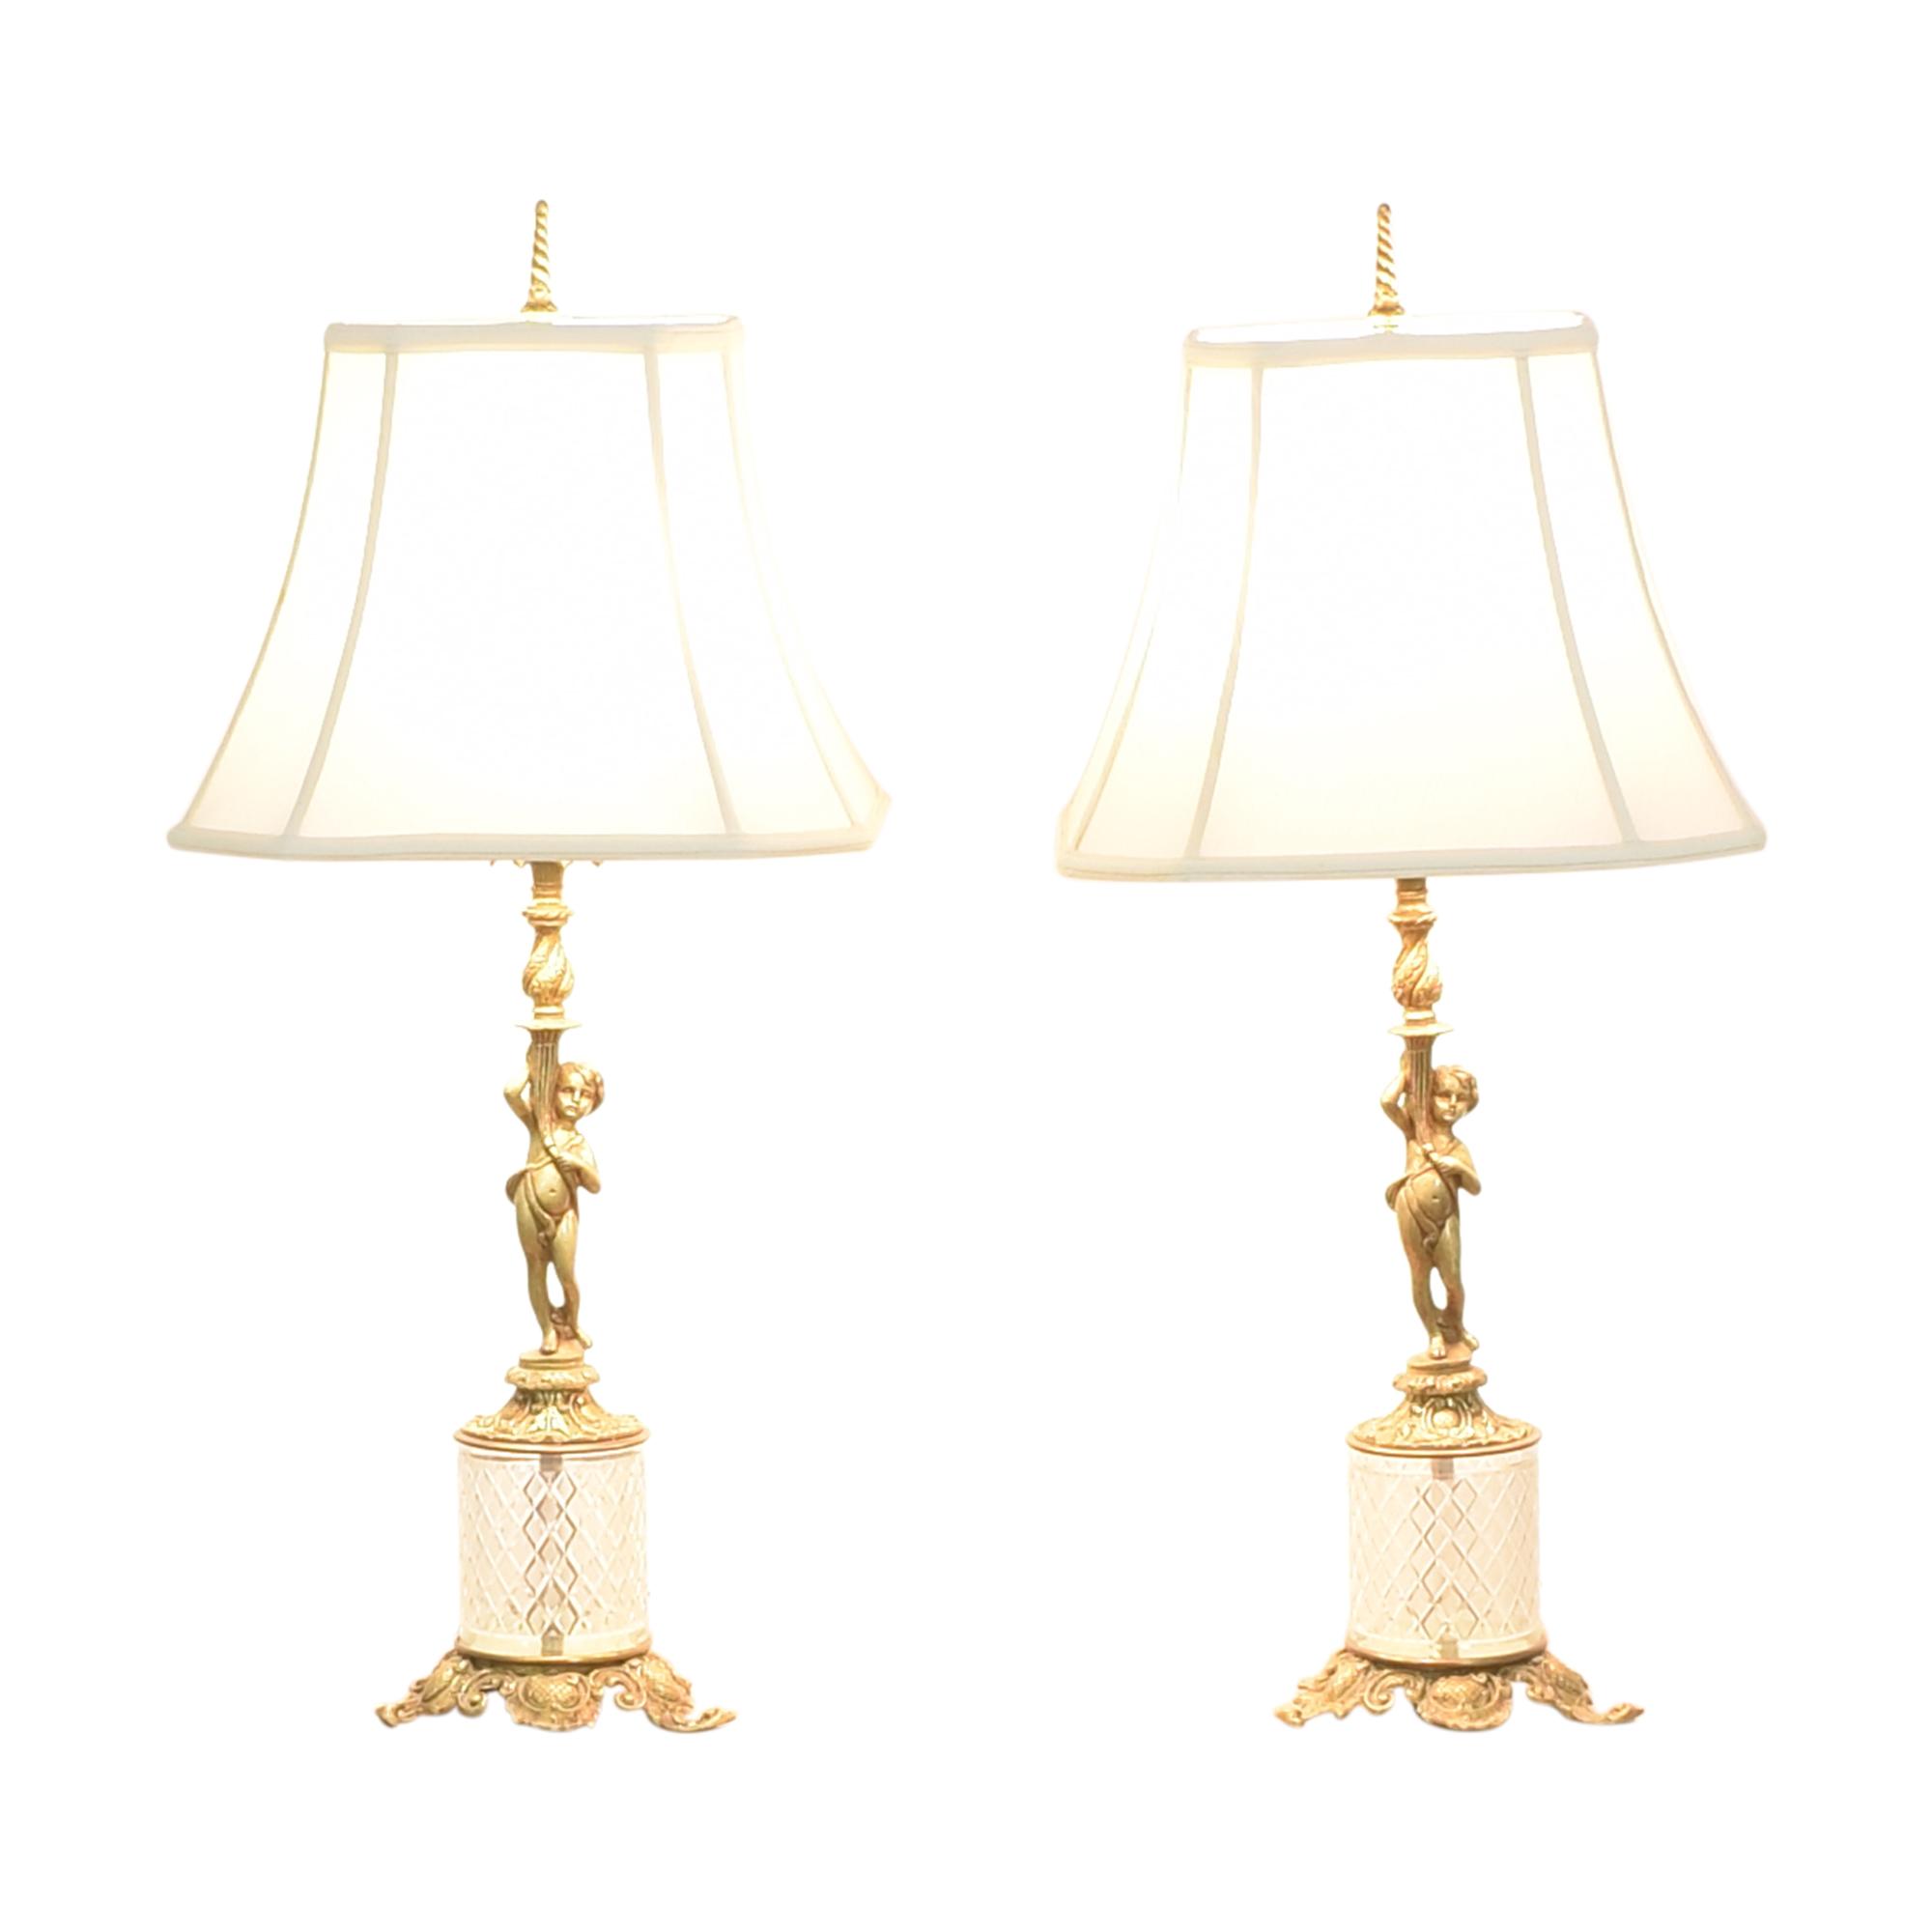 Cherub Table Lamps ct